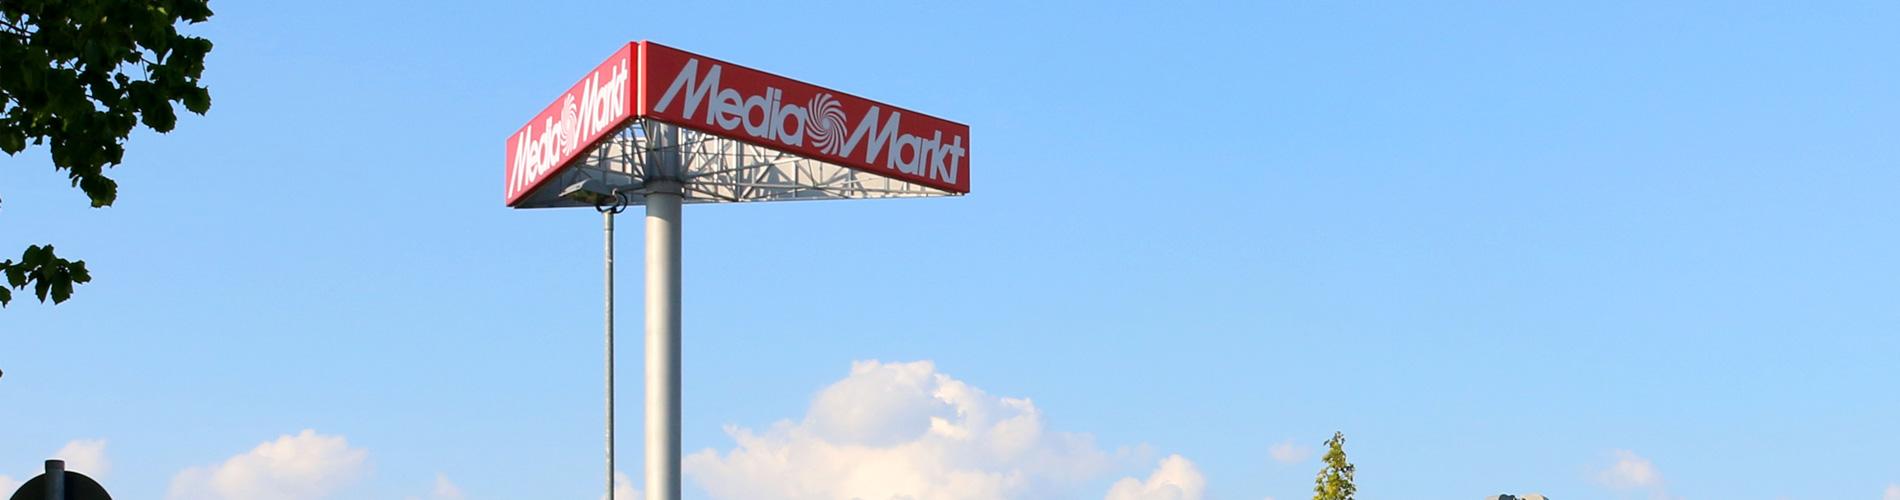 Eschweiler Media Markt